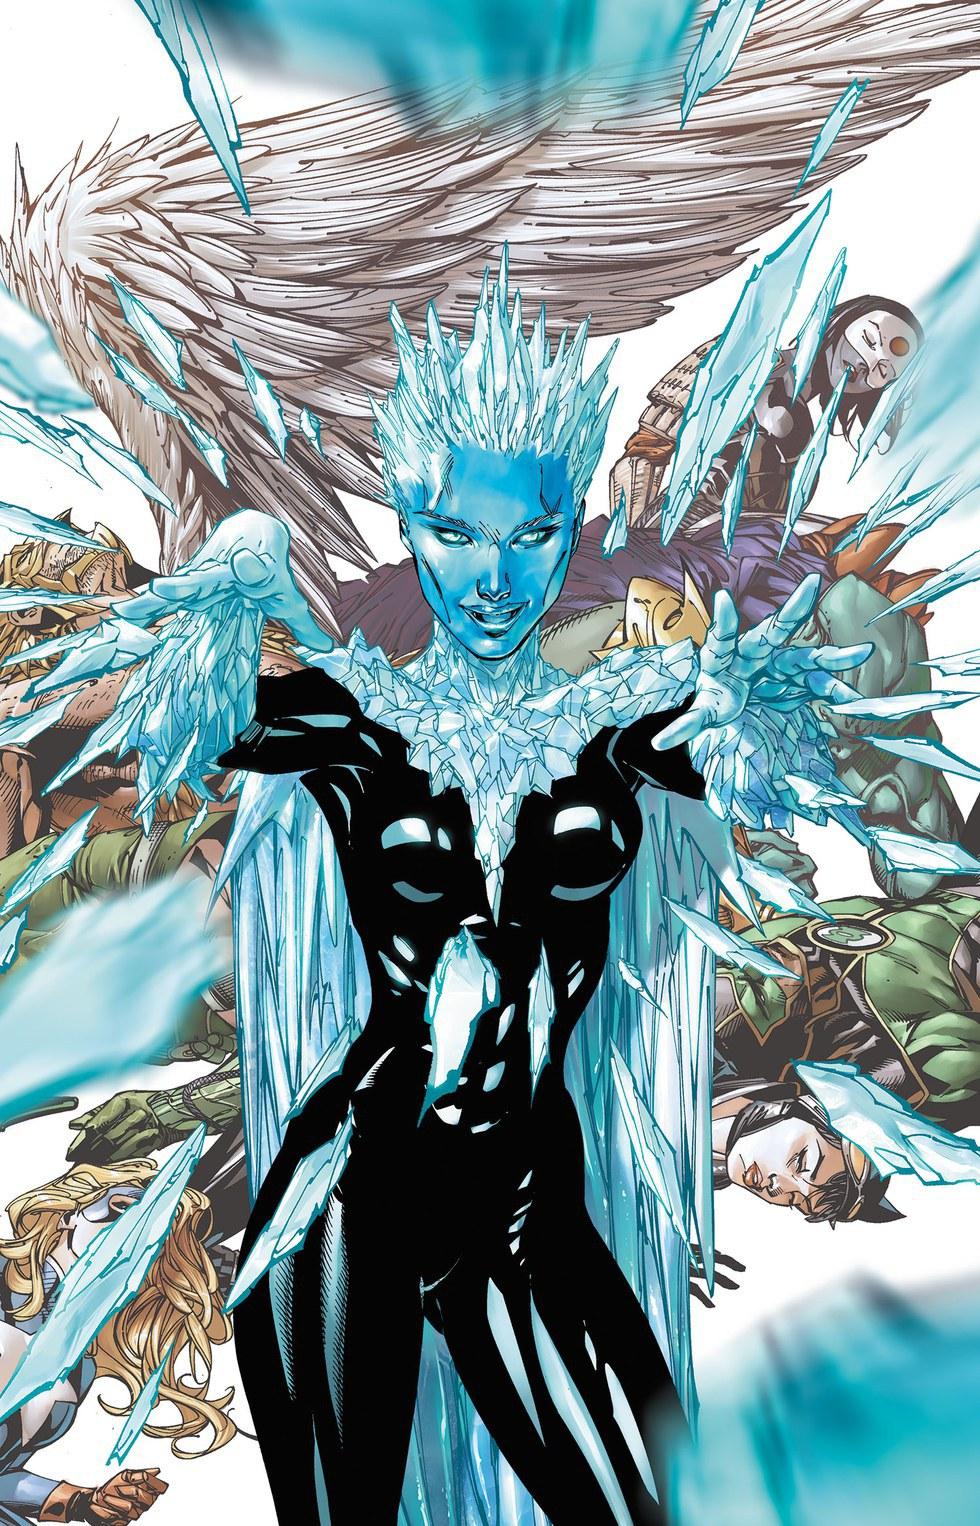 Harley Quinn: Not The \'Bad Girl\' of DC Comics